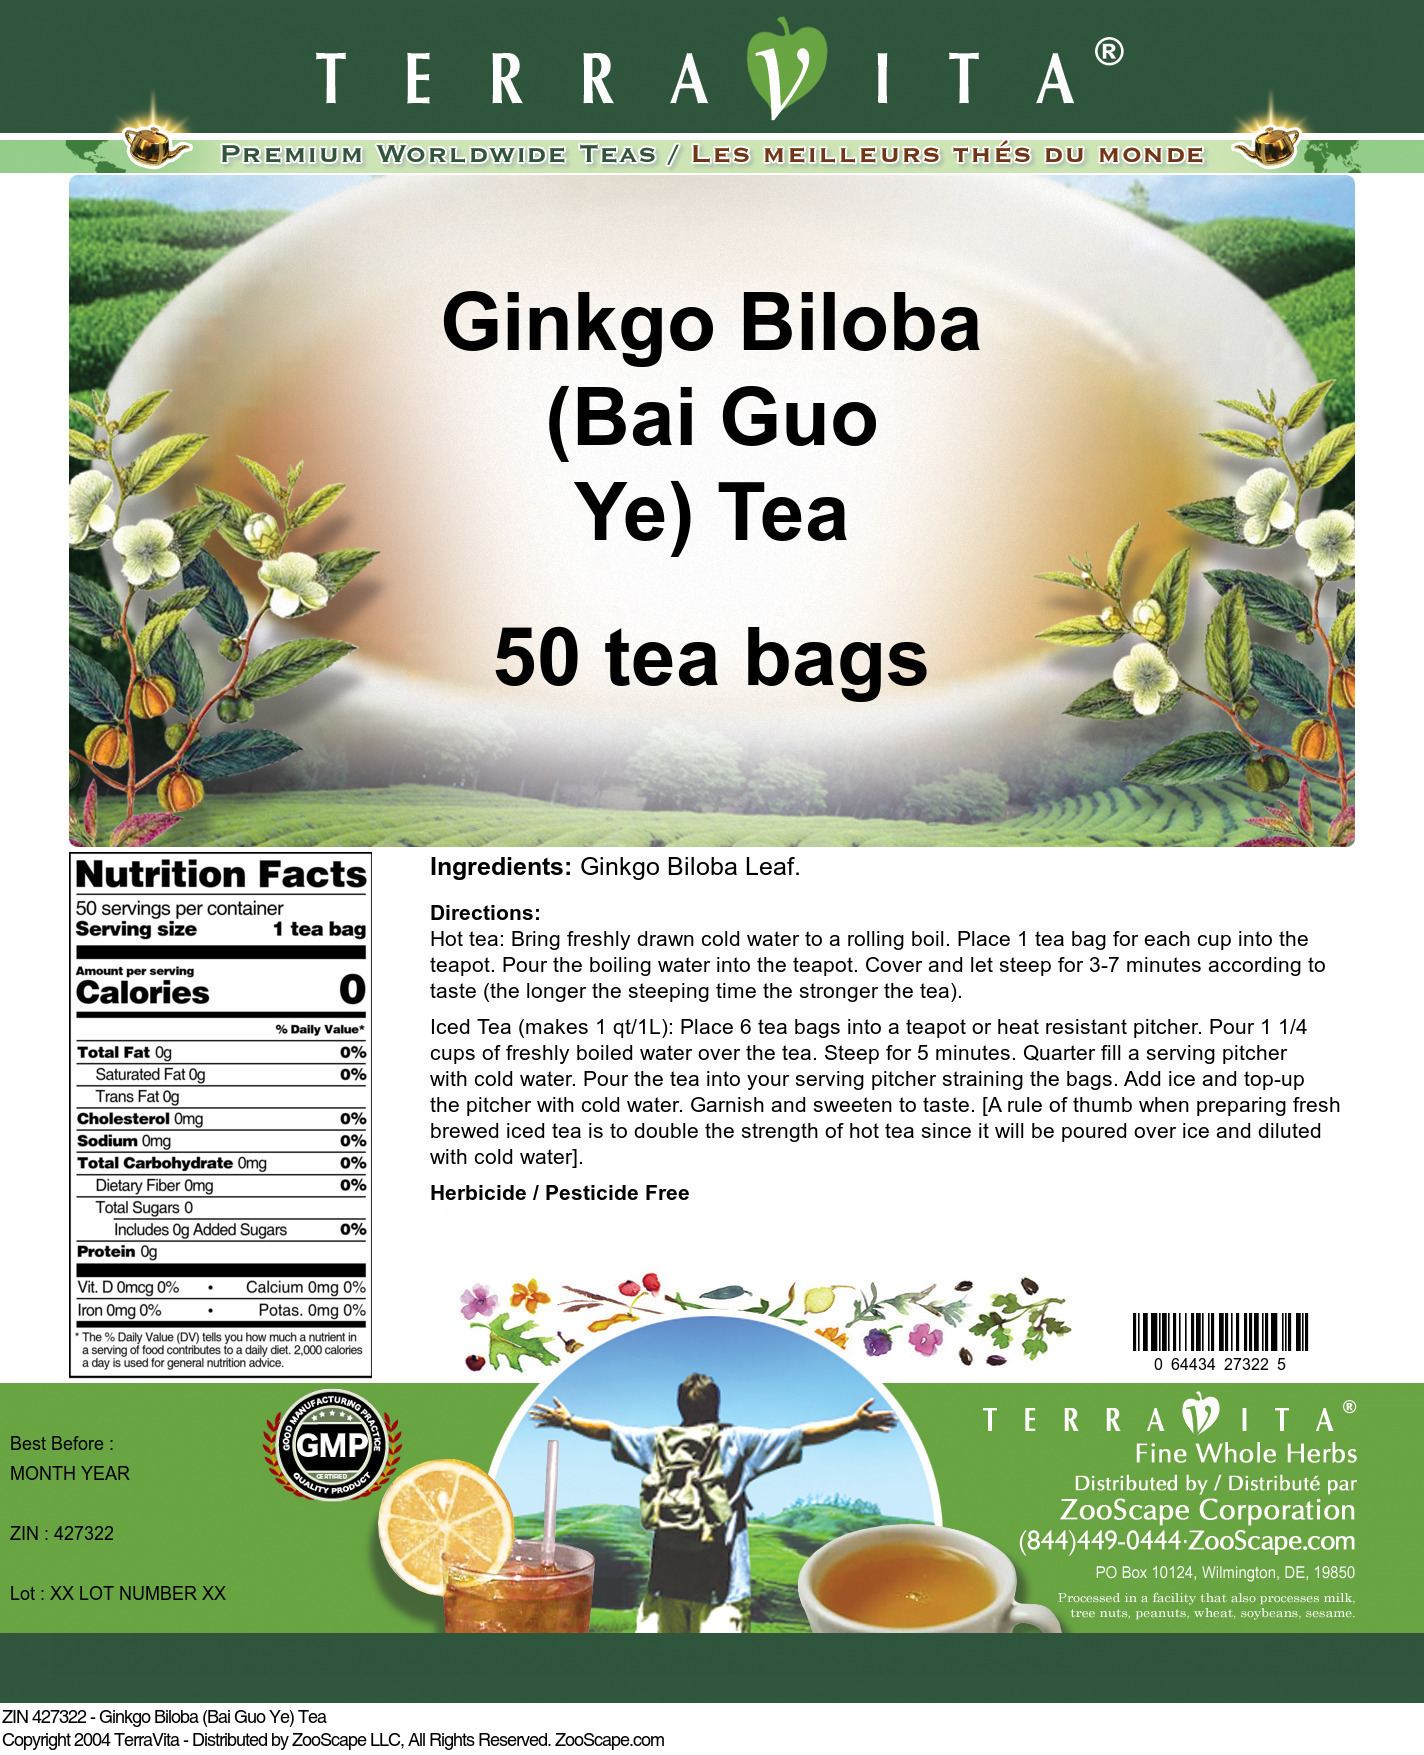 Ginkgo Biloba (Bai Guo Ye) Tea